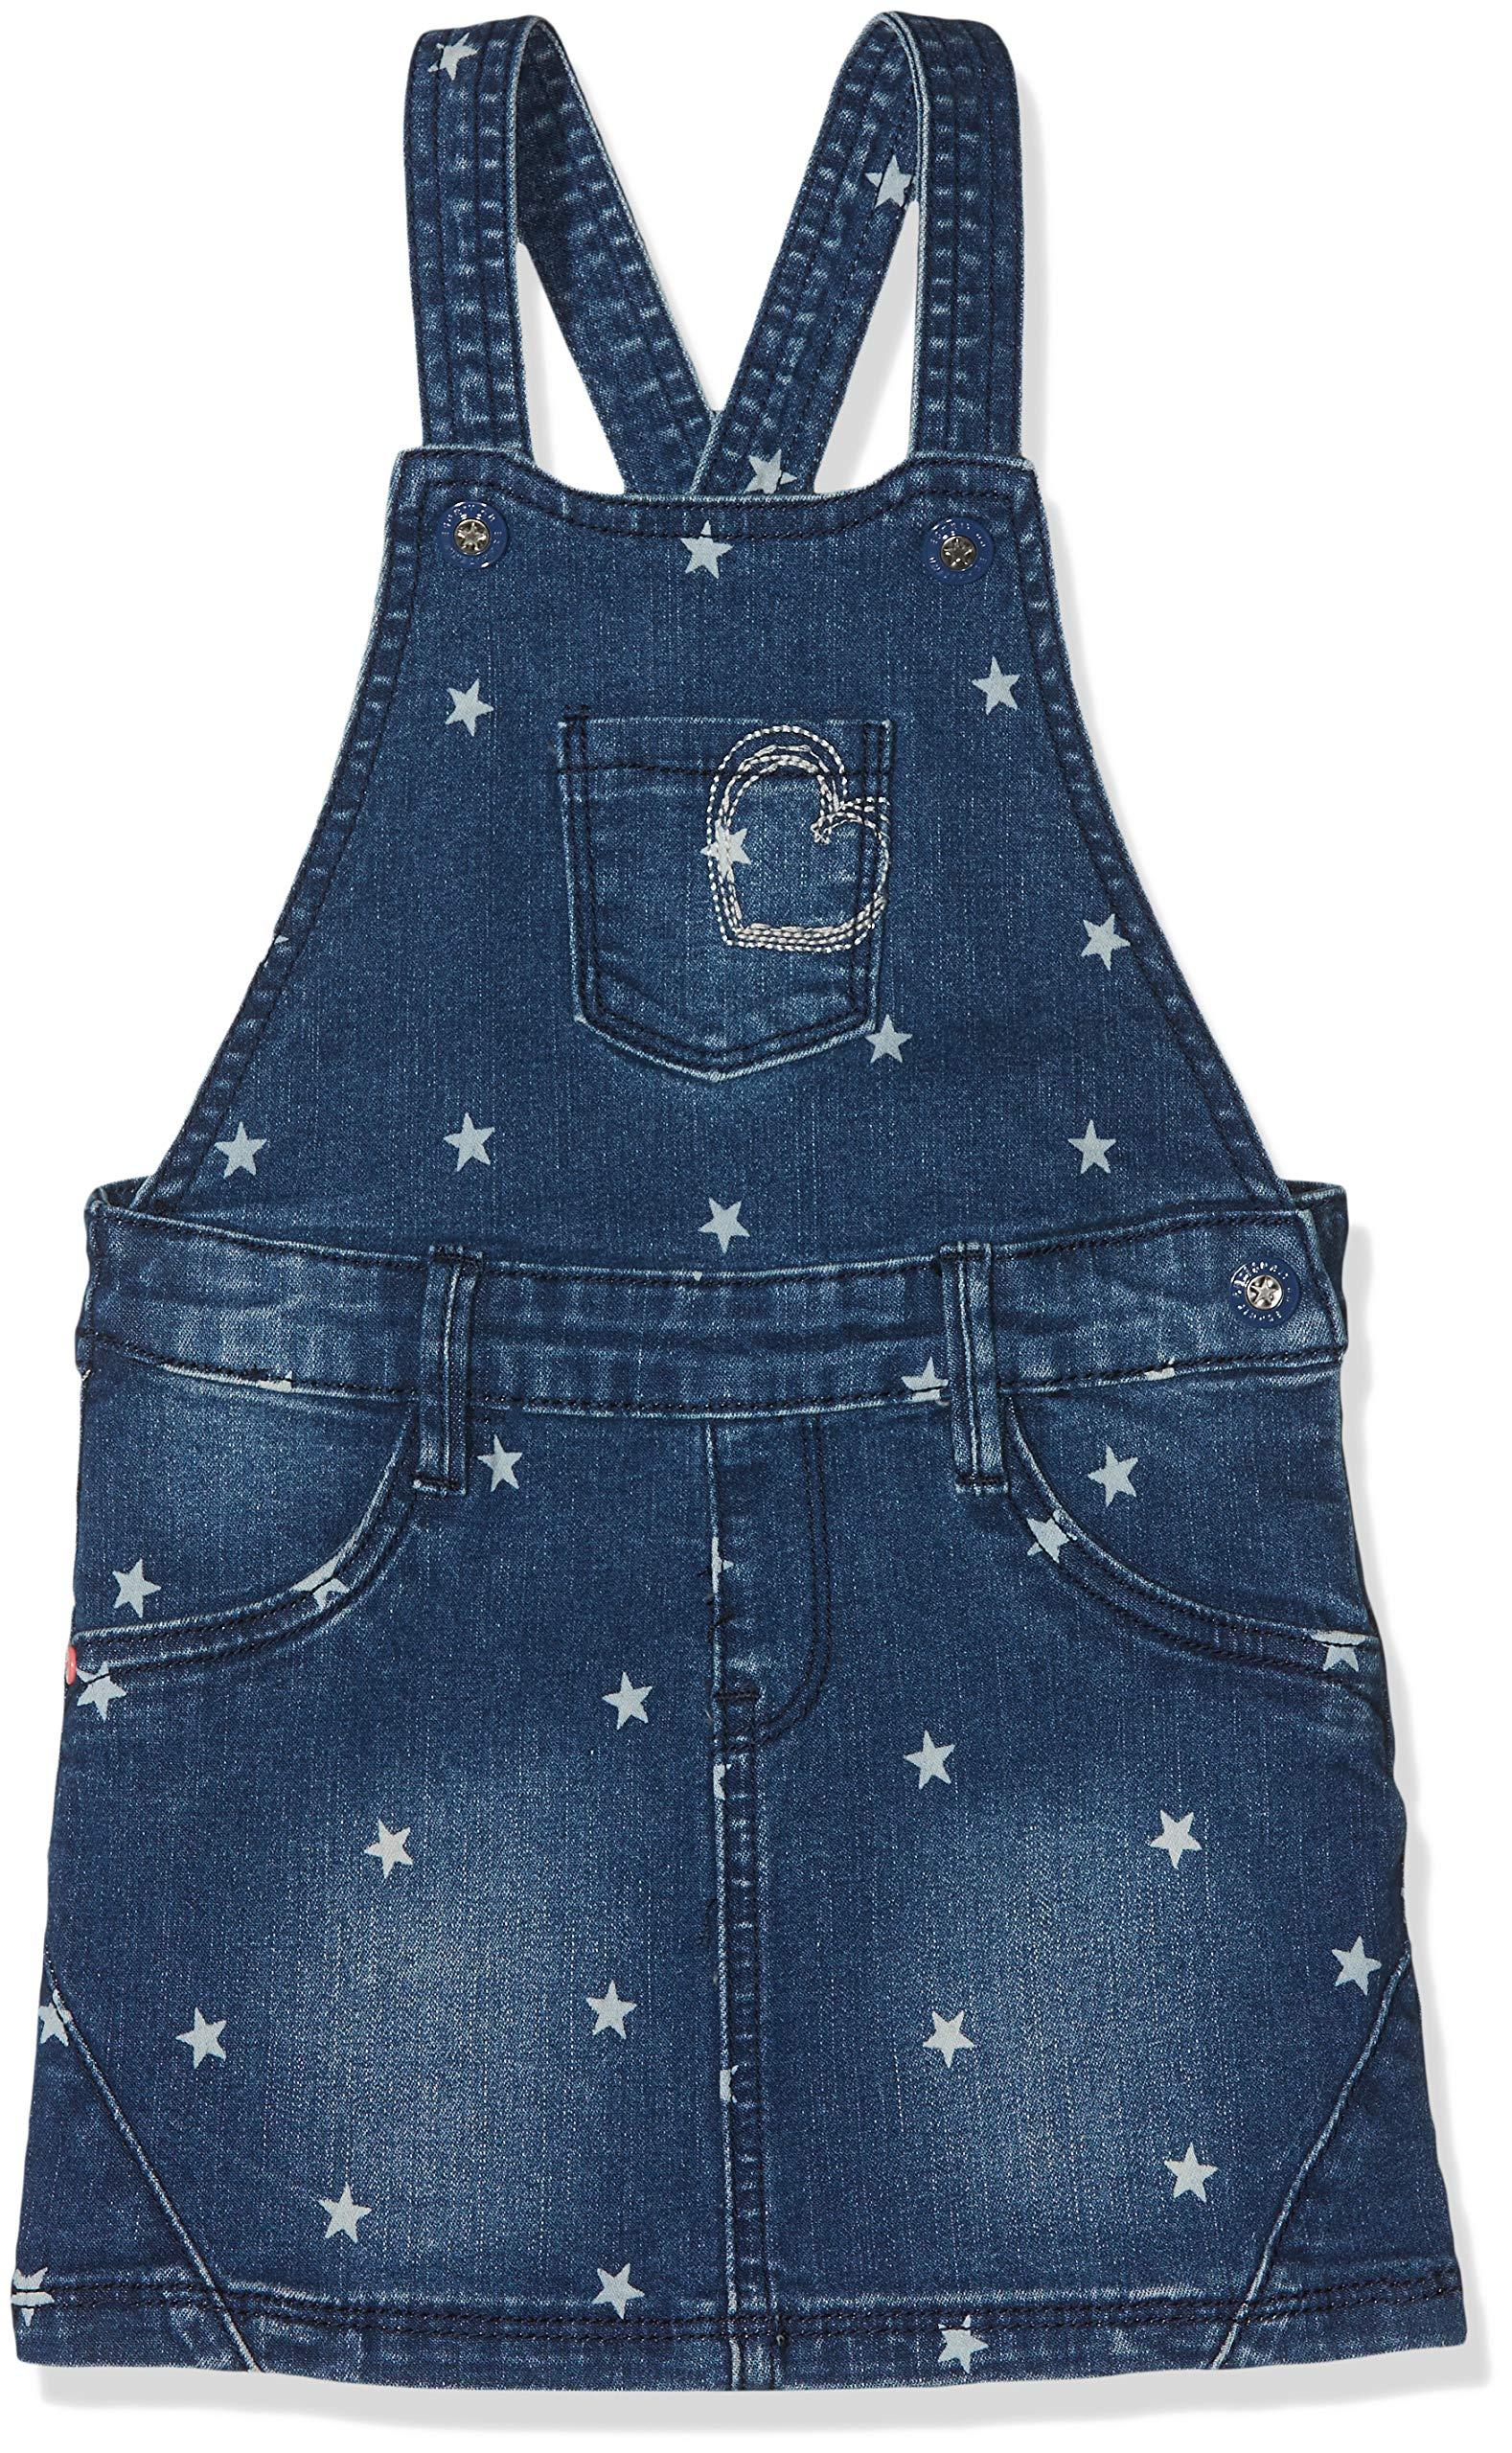 Esprit Kids RM2800107 Falda, Azul (Dark Indigo Denim 461), 92 para Niñas